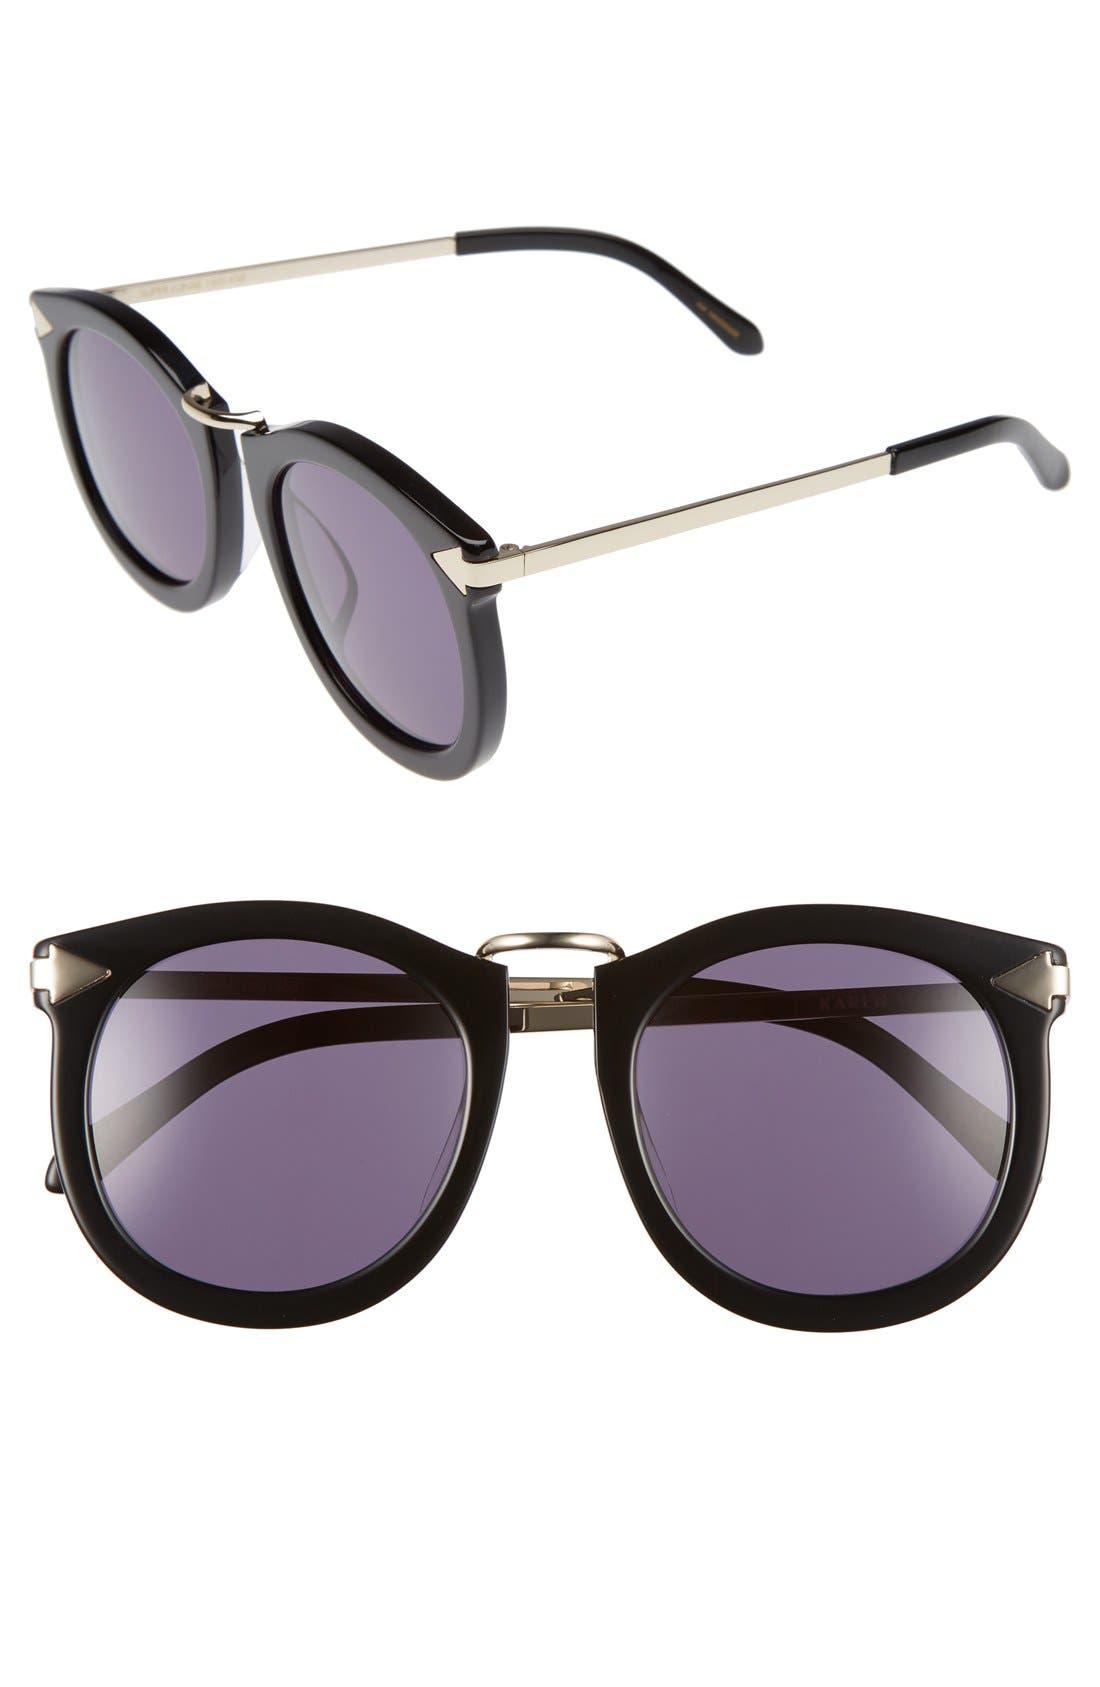 Alternative Fit Super Lunar - Arrowed by Karen 50mm Sunglasses,                             Main thumbnail 1, color,